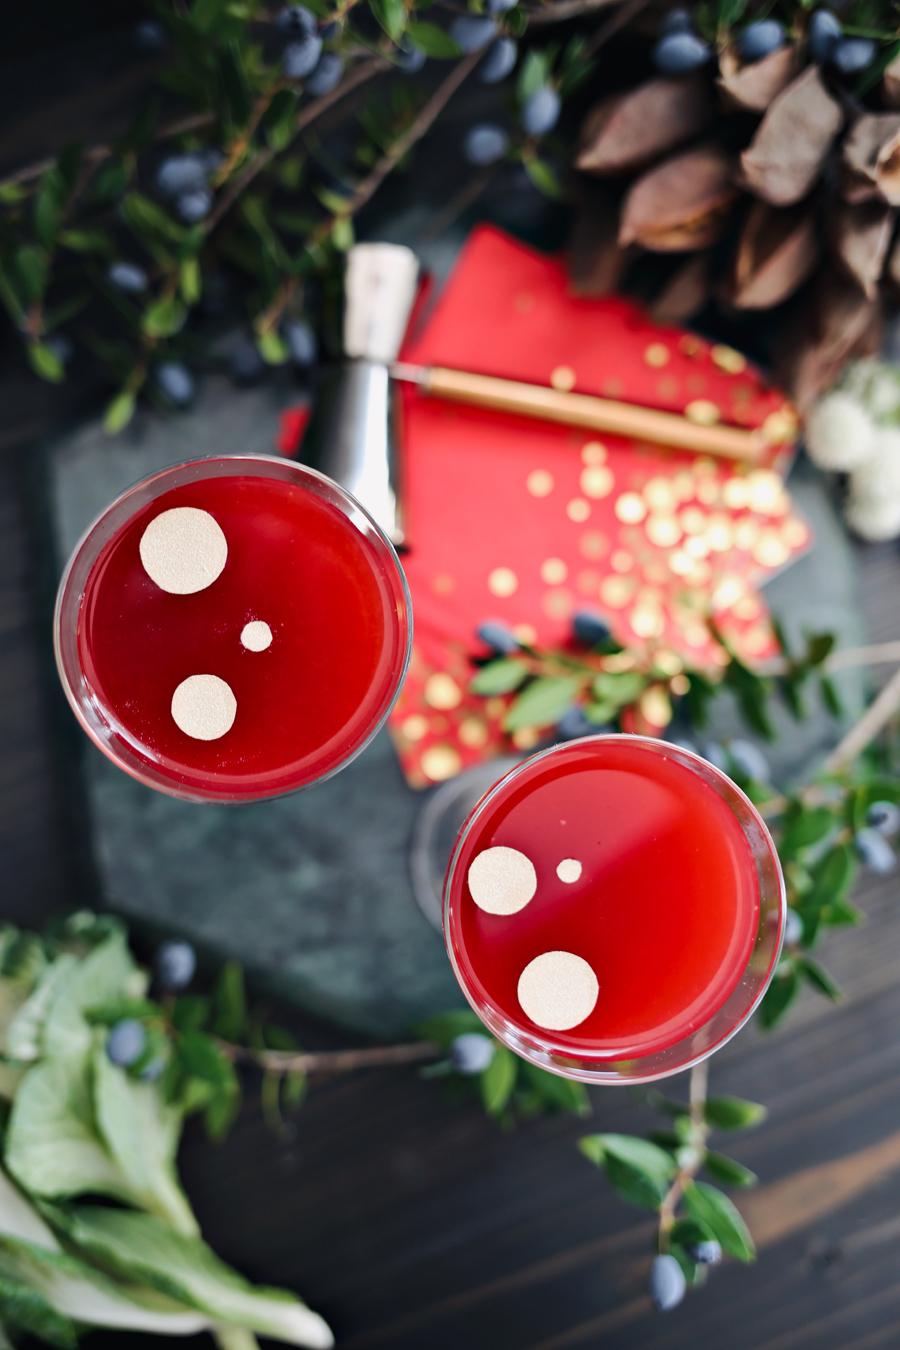 Blood-Orange-Cardamon-Punch-Cocktail-Dine-X-Design.jpg